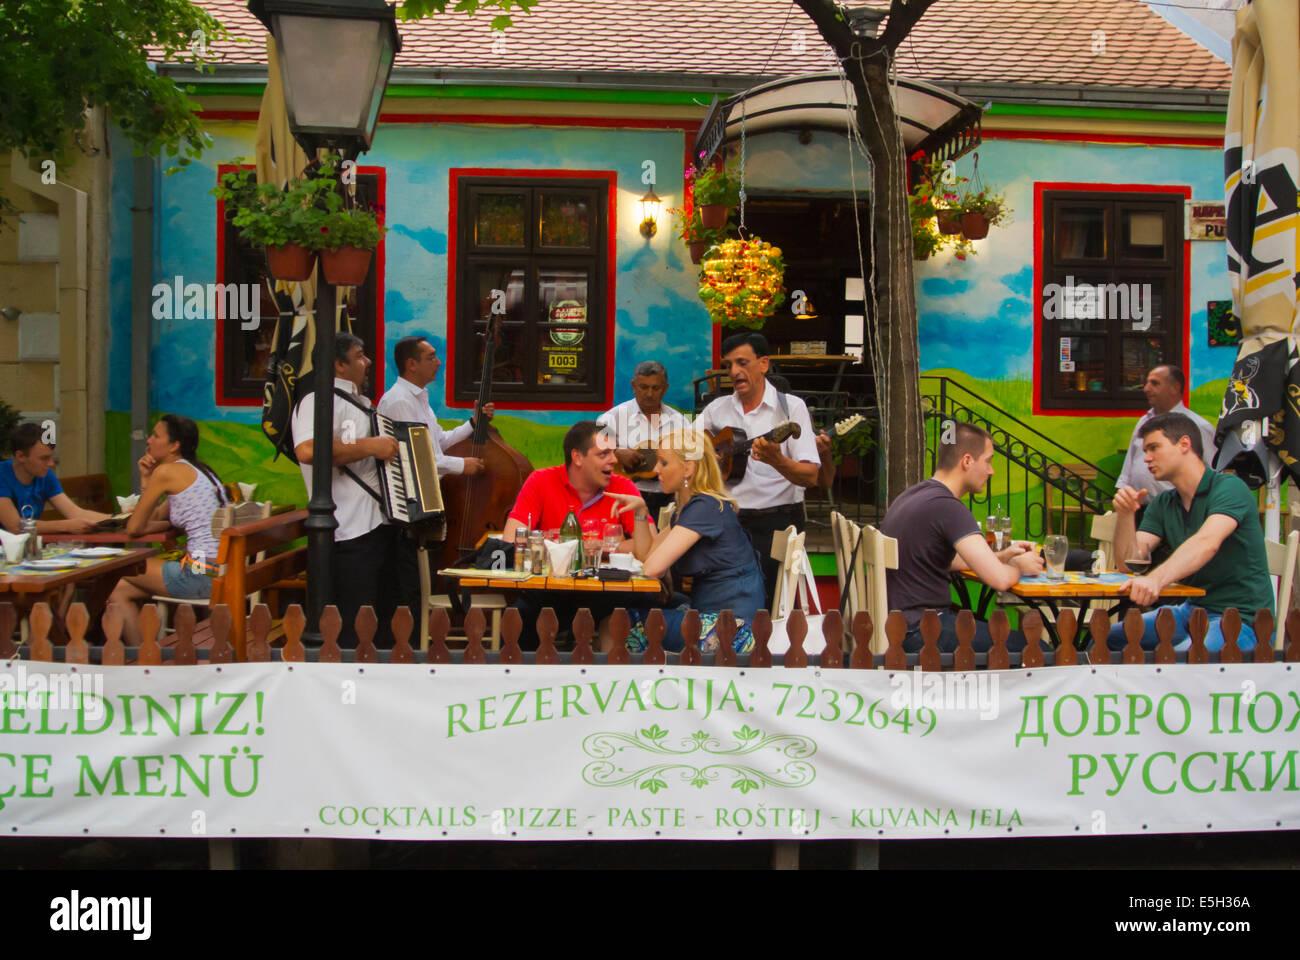 Band playing traditional Serbian music, Skadarlija, Skadarska street, Belgrade, Serbia - Stock Image